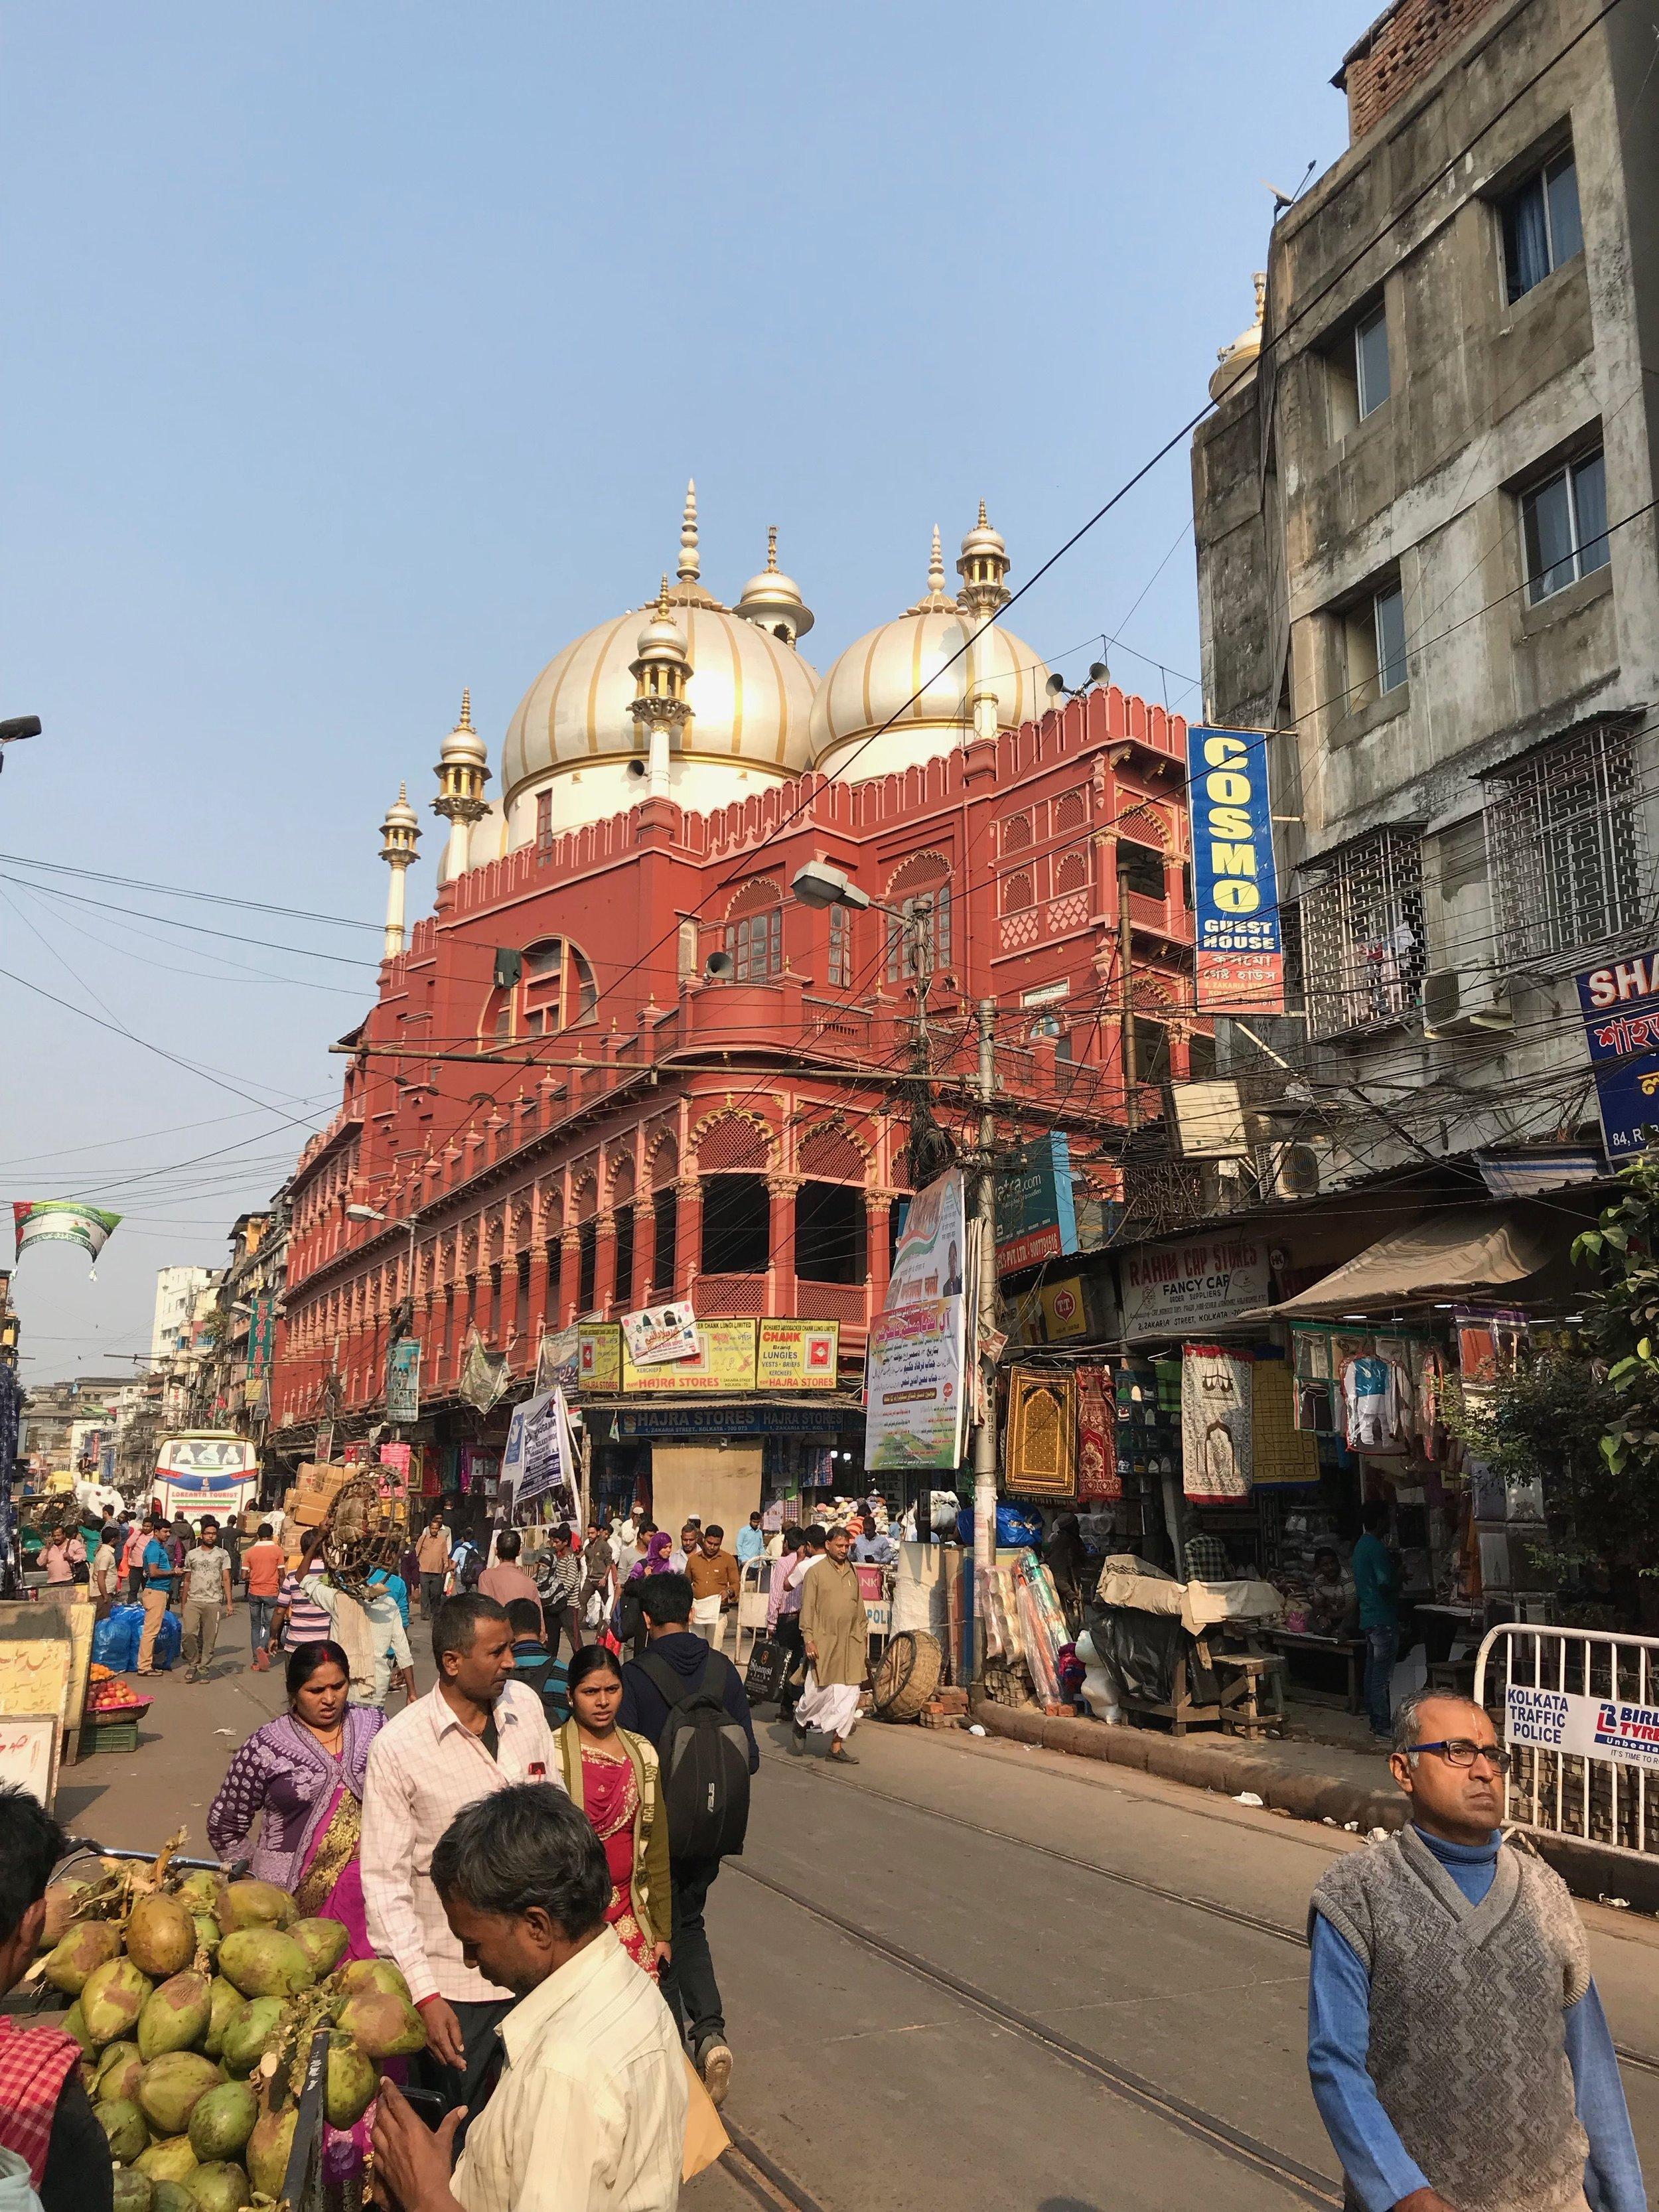 Calcutta (11 au 13 décembre)_4.jpg